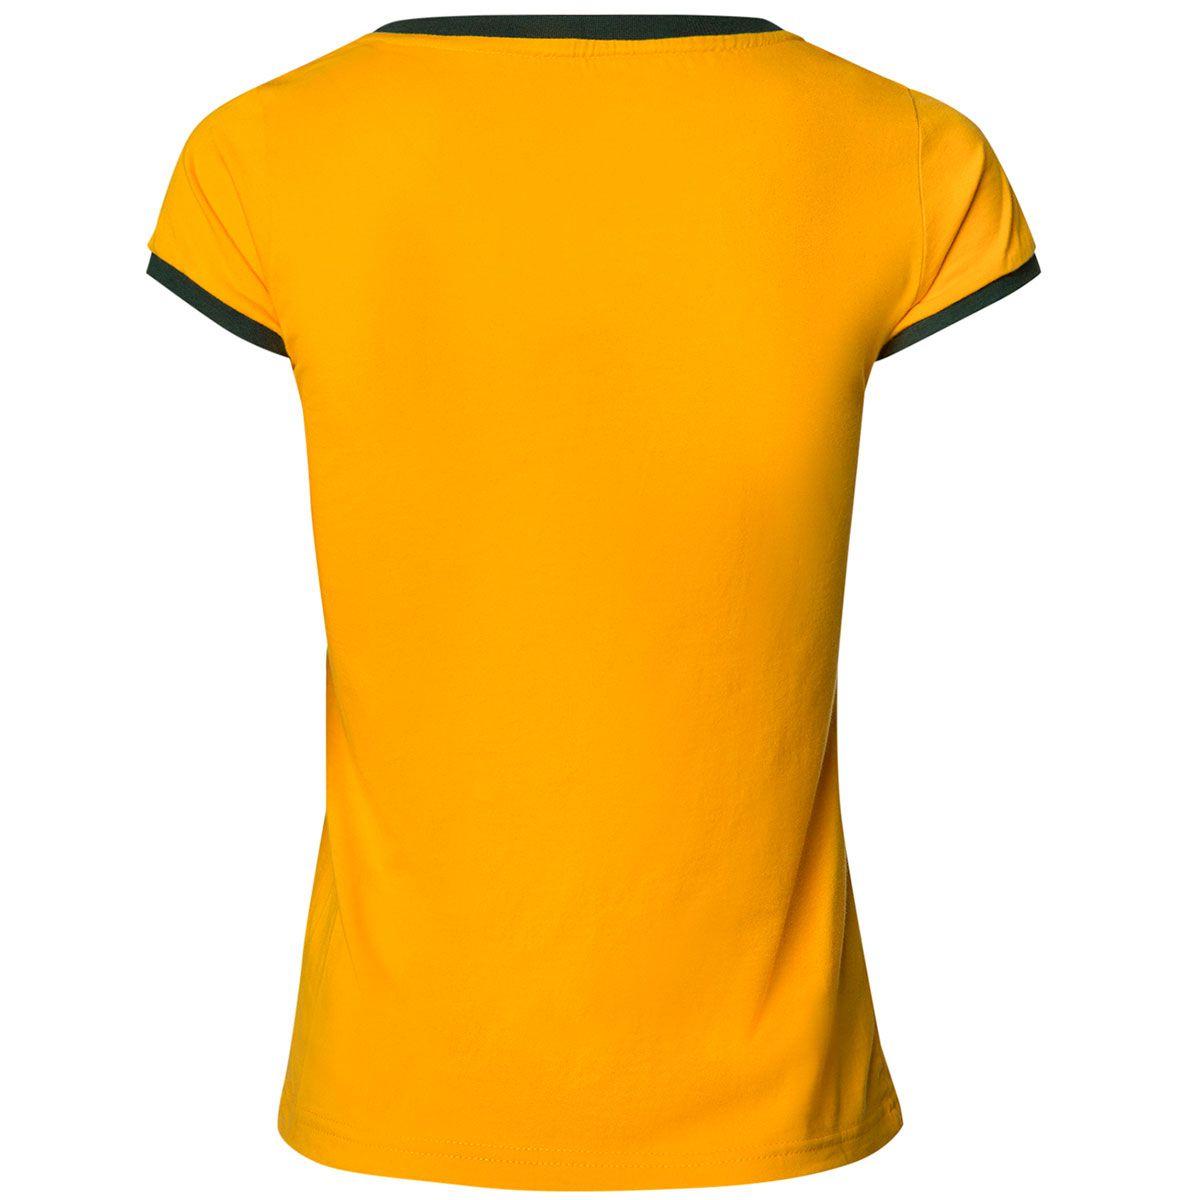 Camisa Feminina Baby Look Retrô Gol Fortaleza Seleção Brasil Torcedor